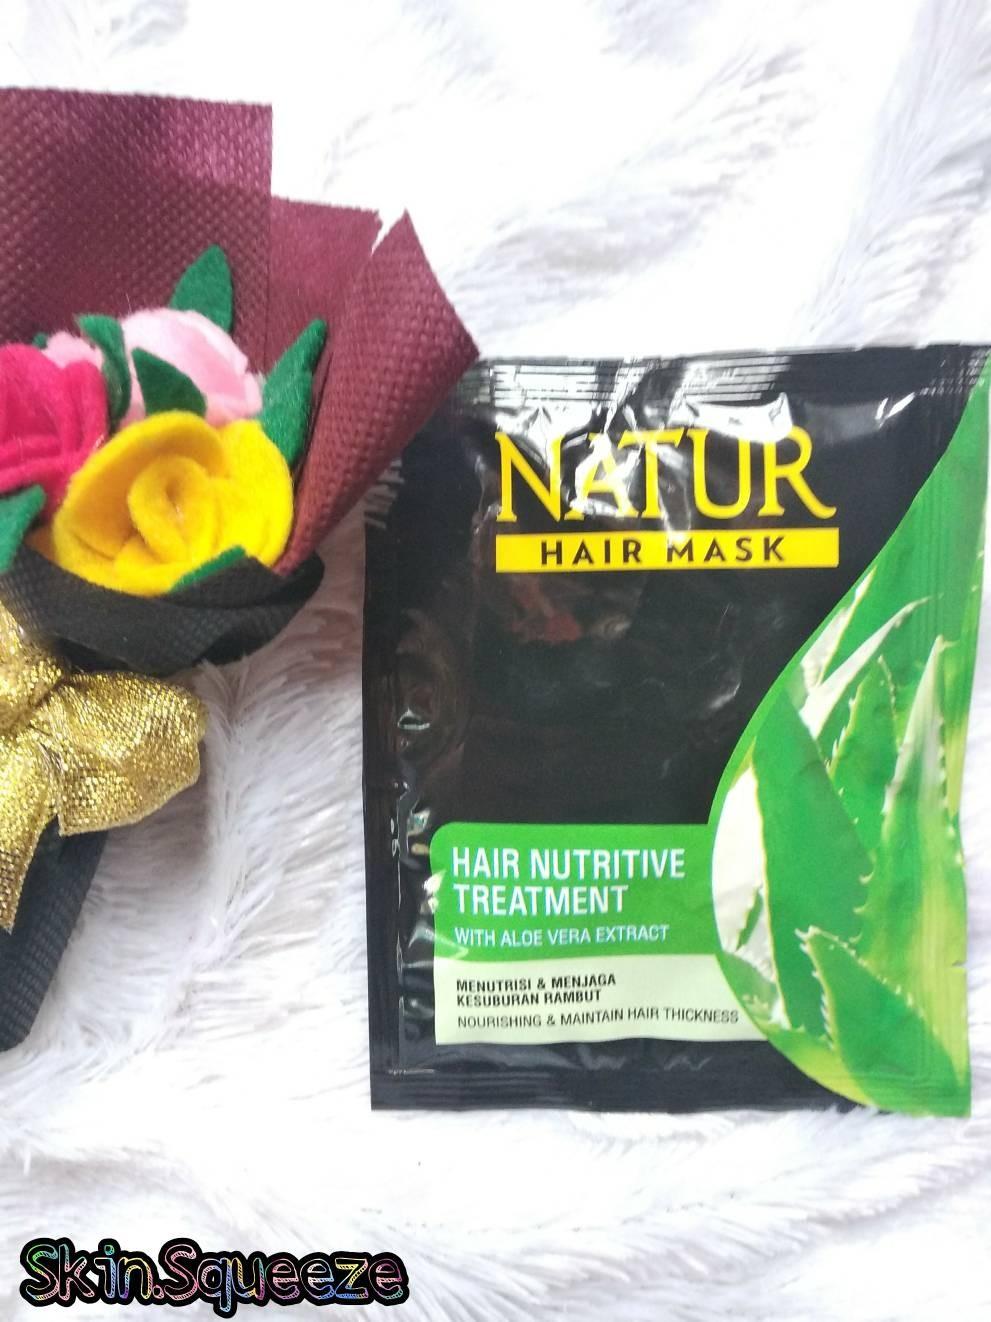 Natur Aloe Vera Extract & Olive Oil Hair Mask